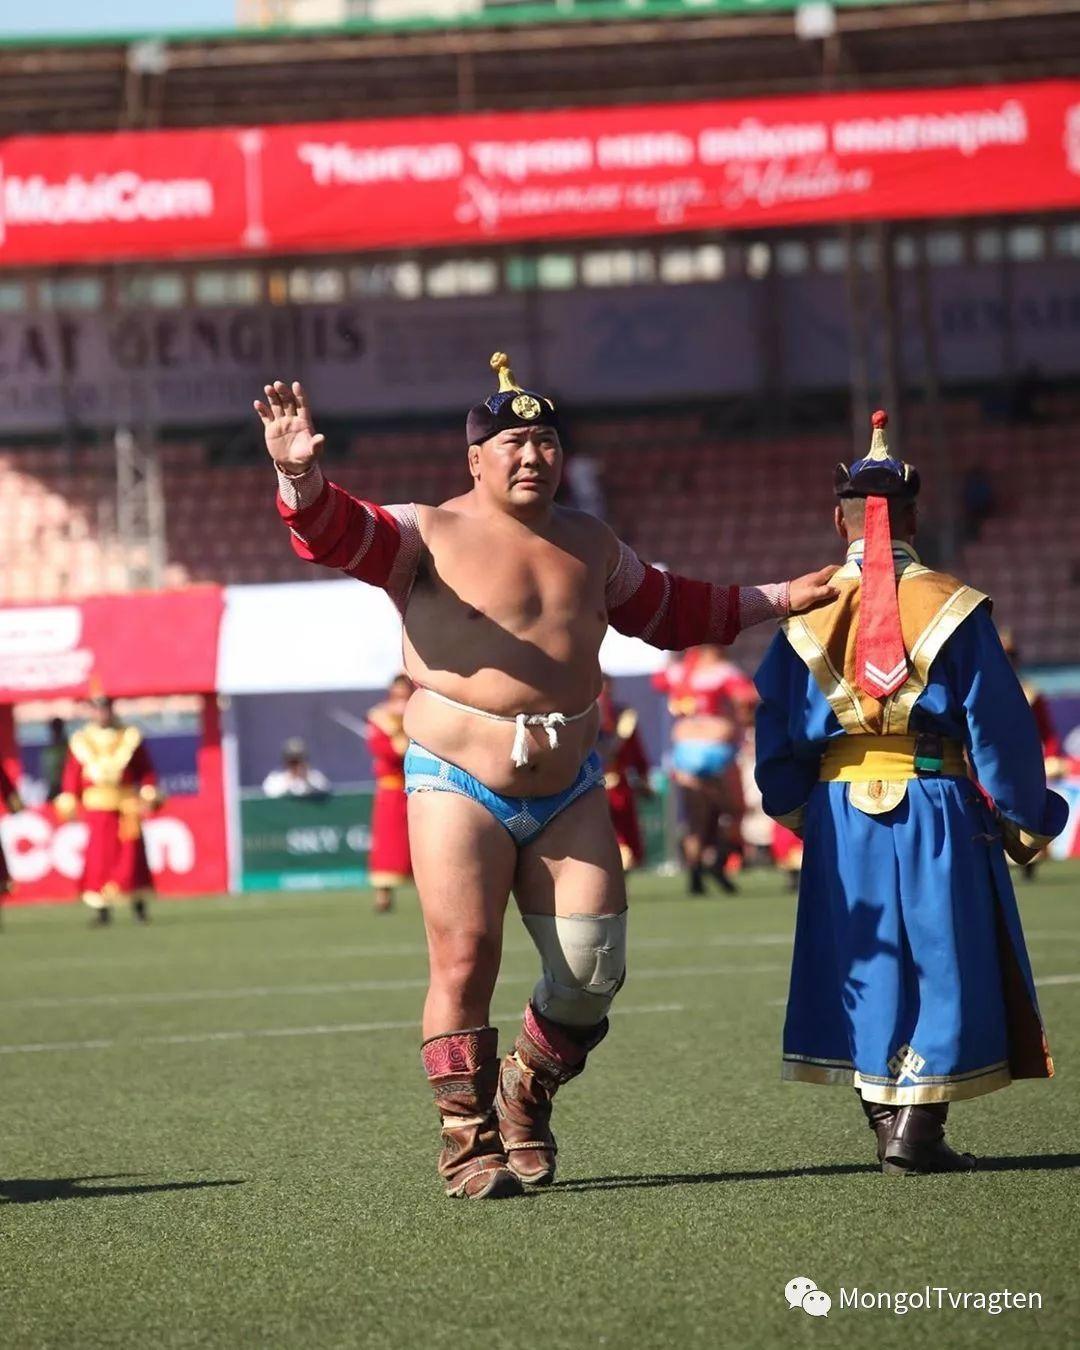 ᠮᠣᠩᠭᠣᠯ ᠨᠠᠭᠠᠳᠣᠮ 那达慕 第76张 ᠮᠣᠩᠭᠣᠯ ᠨᠠᠭᠠᠳᠣᠮ 那达慕 蒙古文化